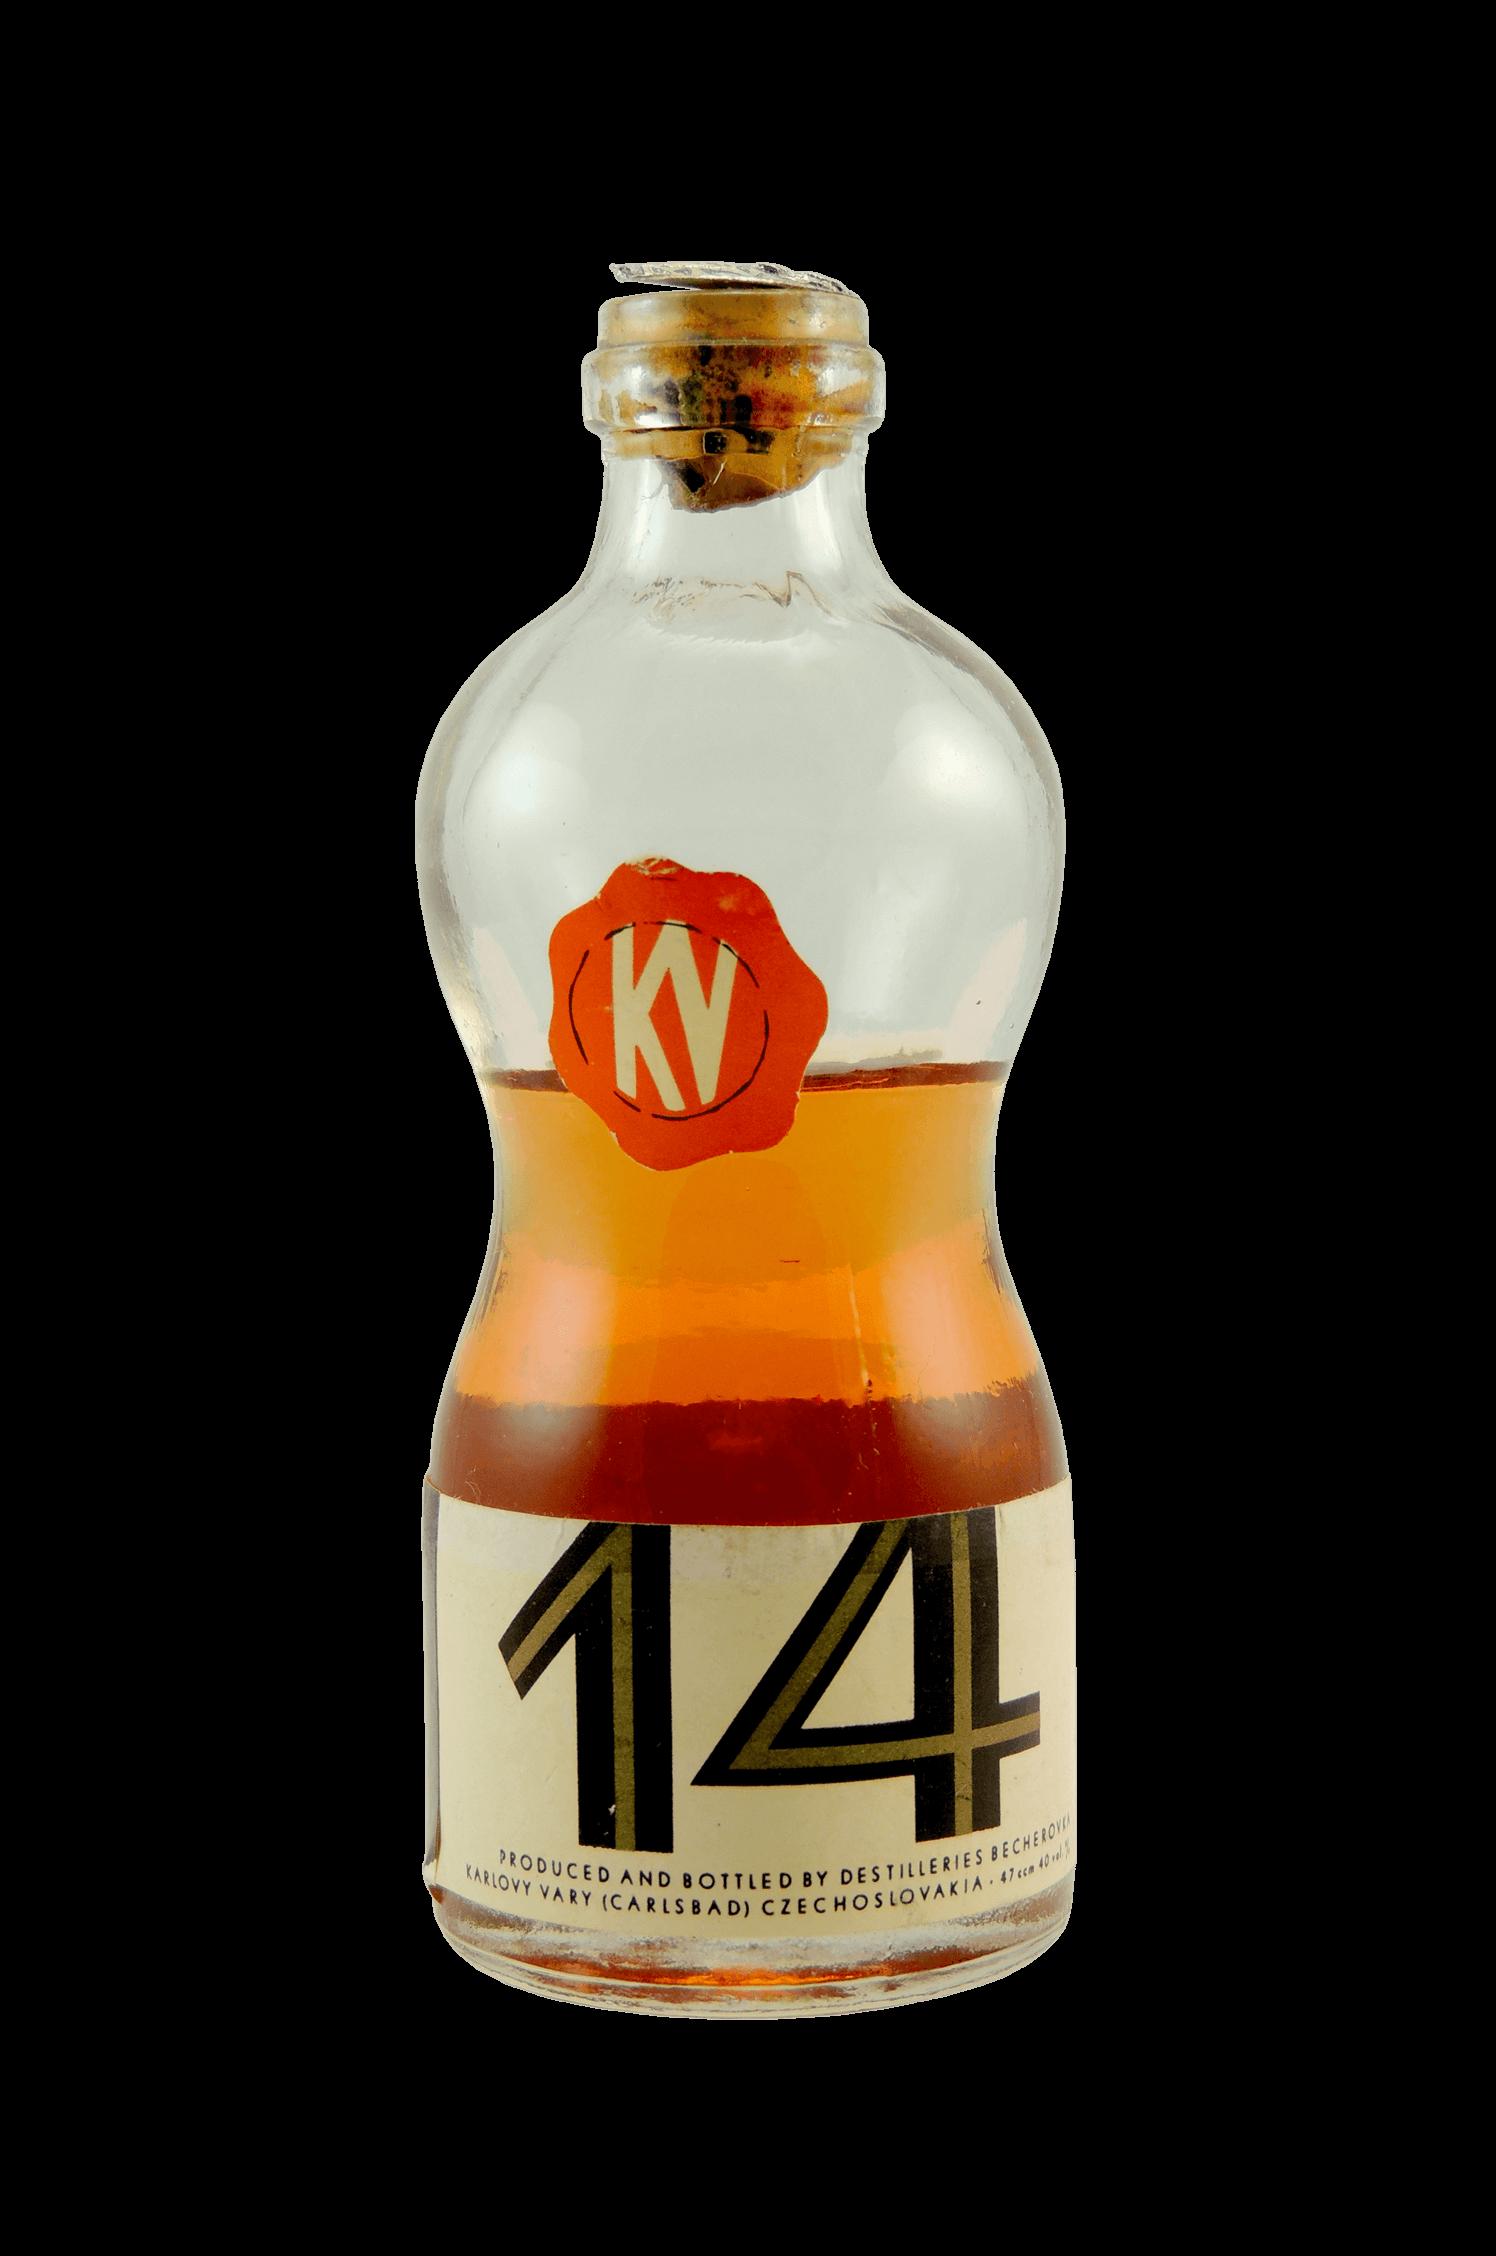 KV 14